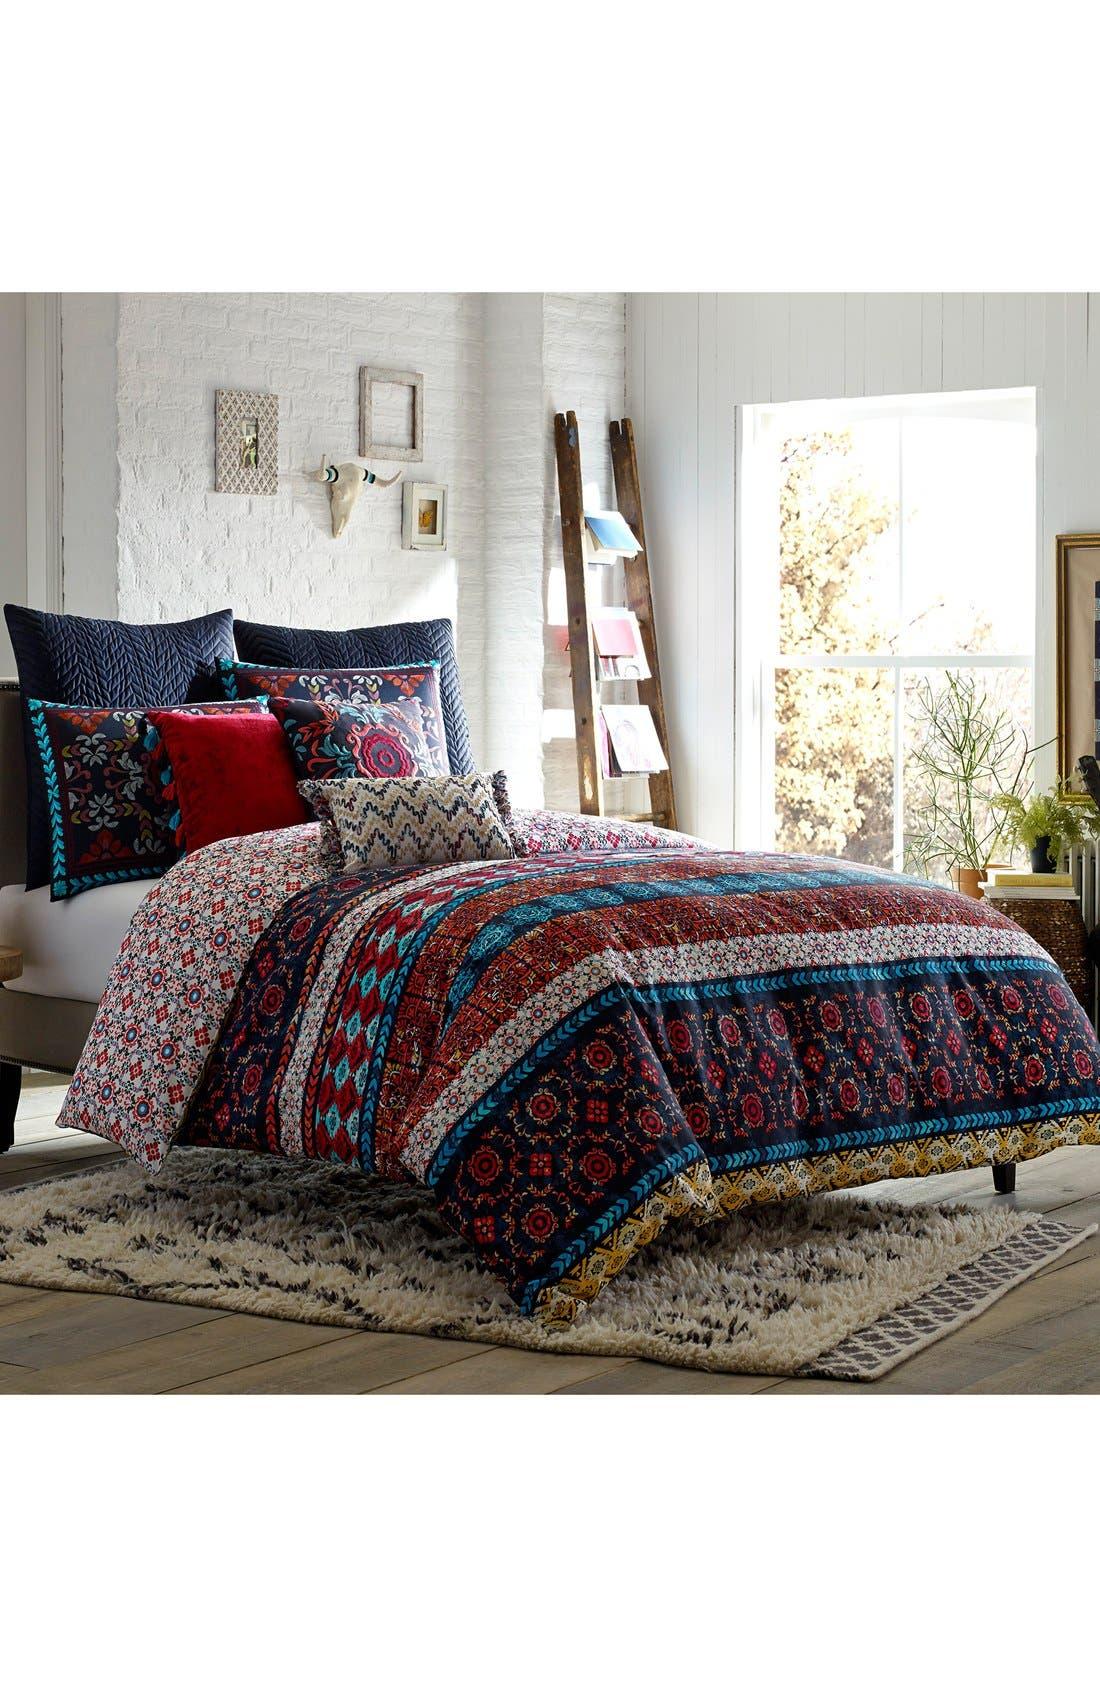 Marshalls Bed Sheets Dwellstudio Bedding Collection